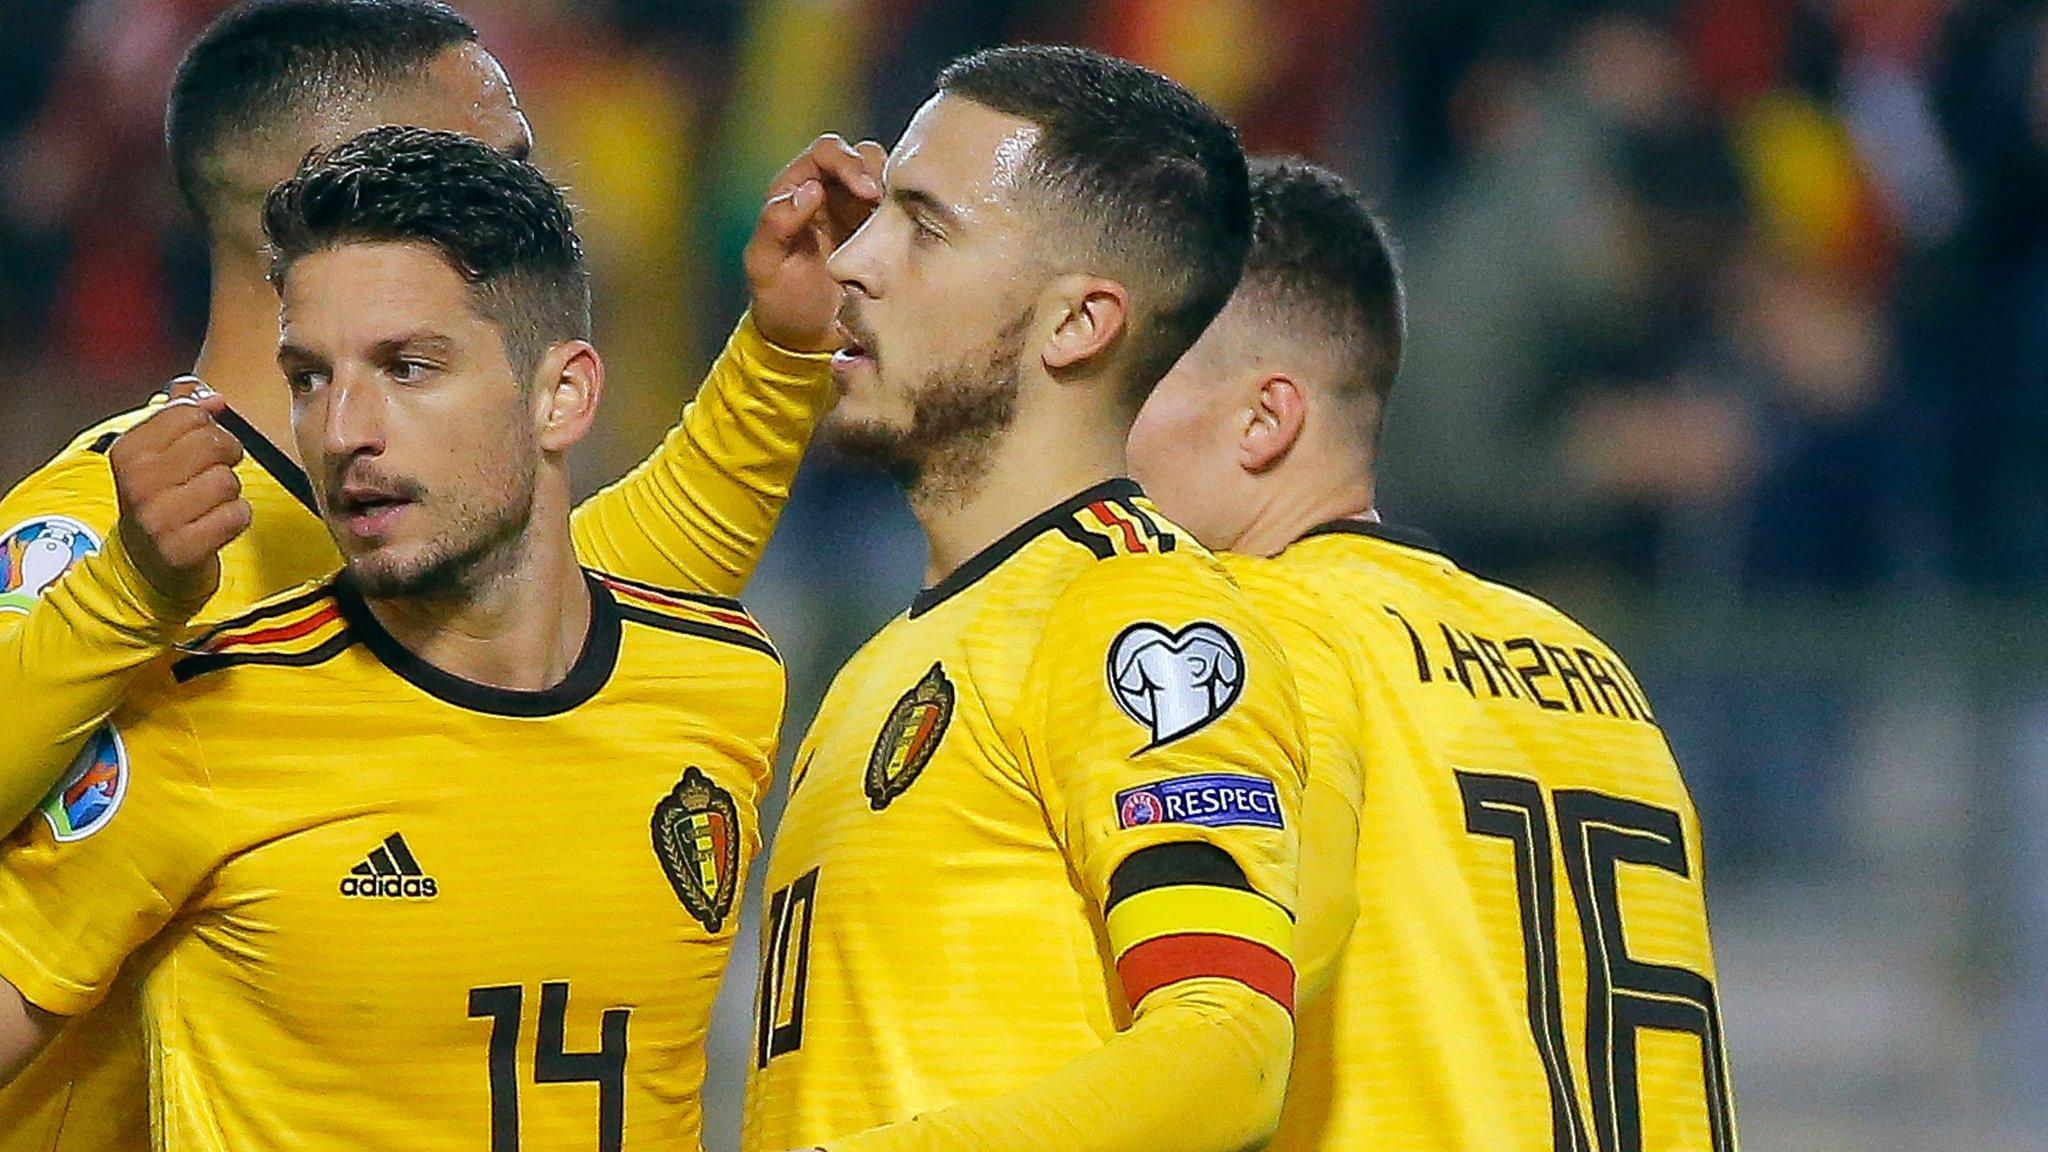 Belgium 3-1 Russia: Eden Hazard scores twice in Euro 2020 qualifier